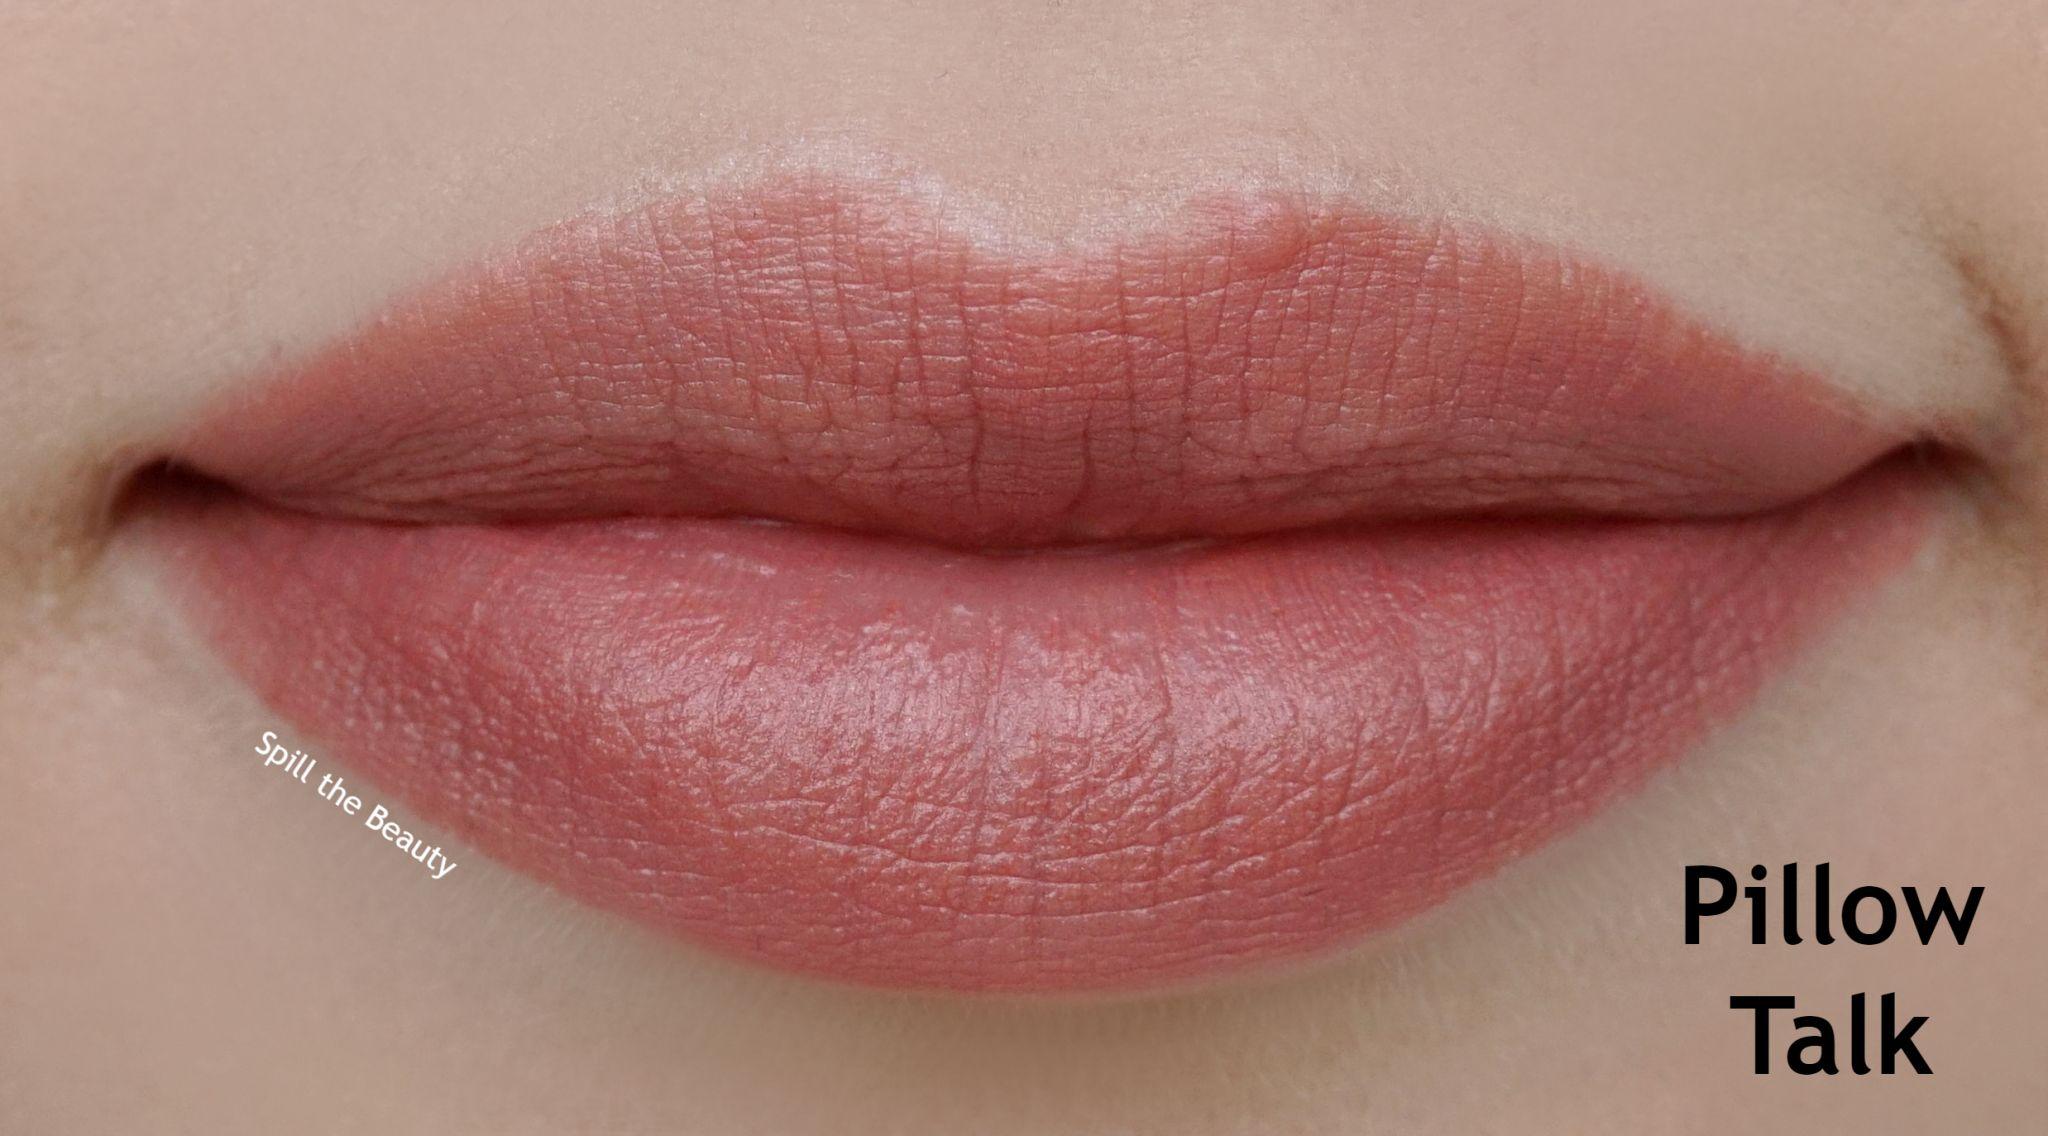 Pillow Talk Lipstick Dupe